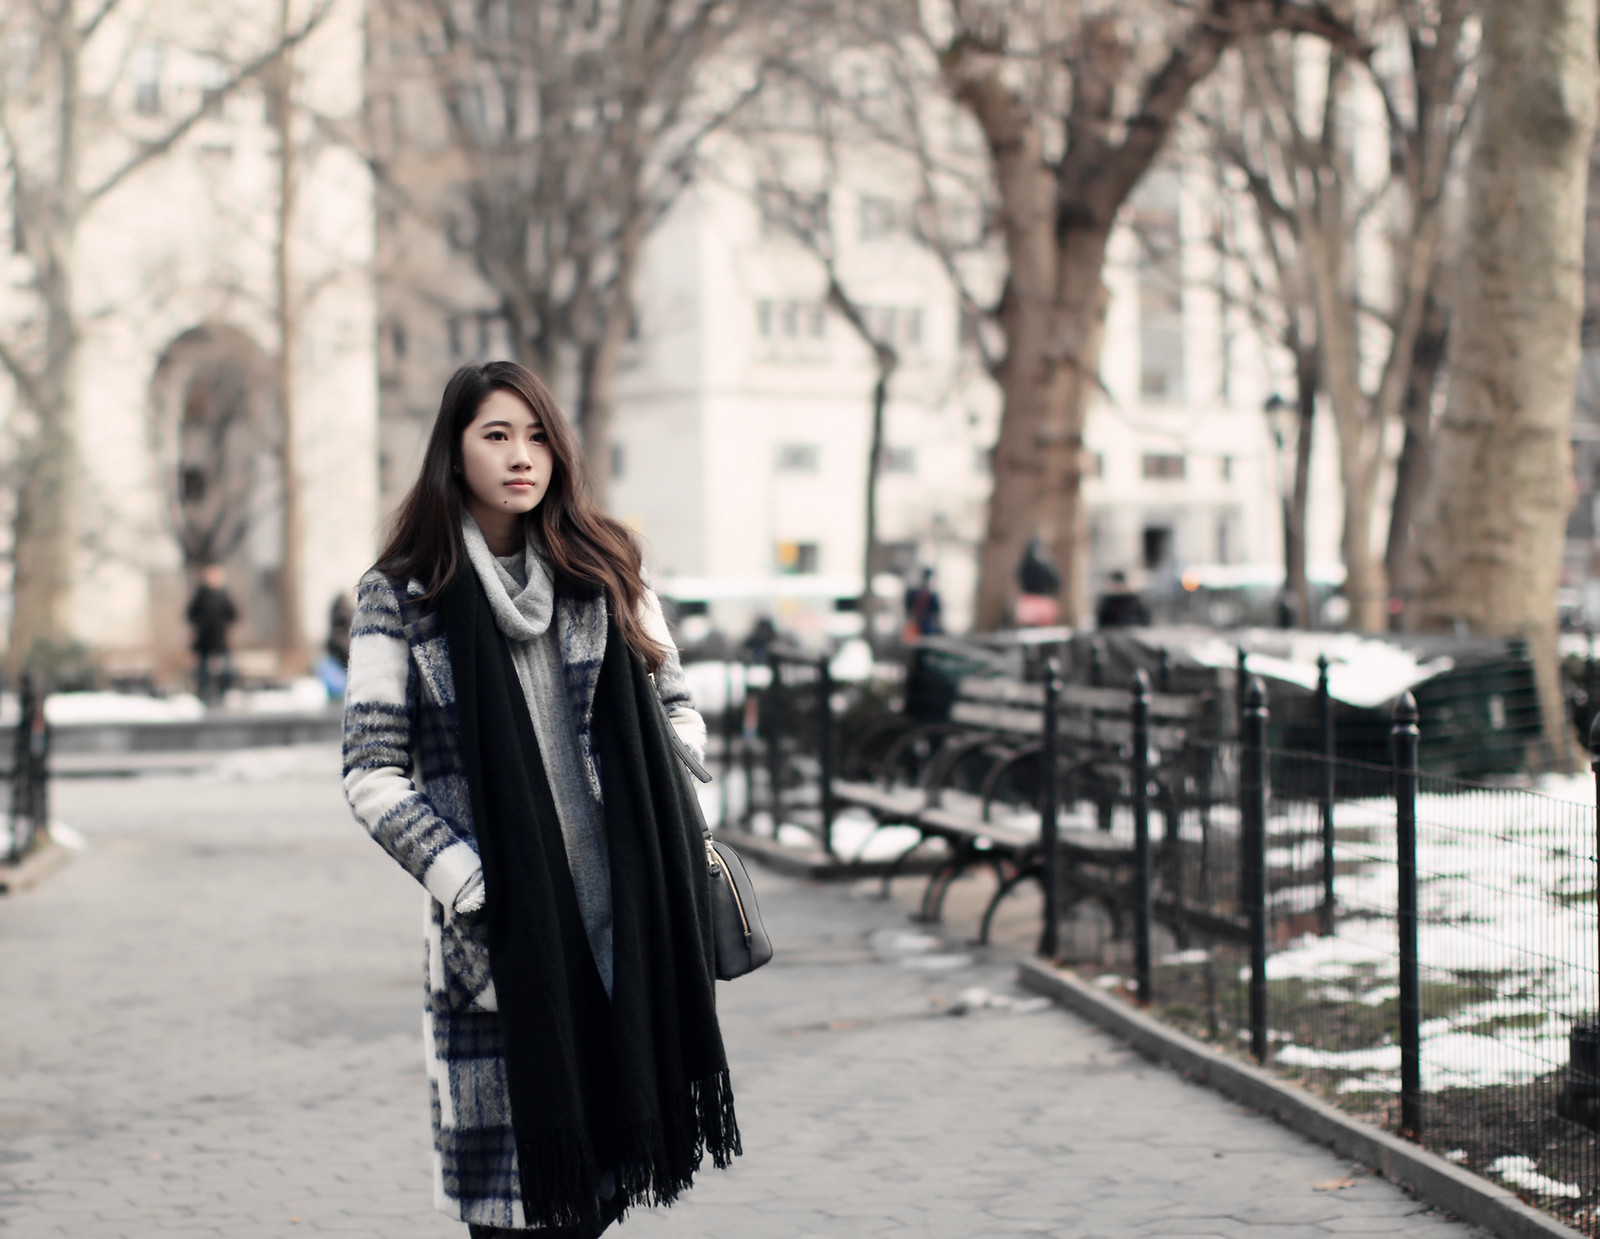 2078-clothestoyouuu-elizabeeetht-nyfw-newyorkfashionweek-nyc-fashionweek-newyork- winter2017-fashion-ootd